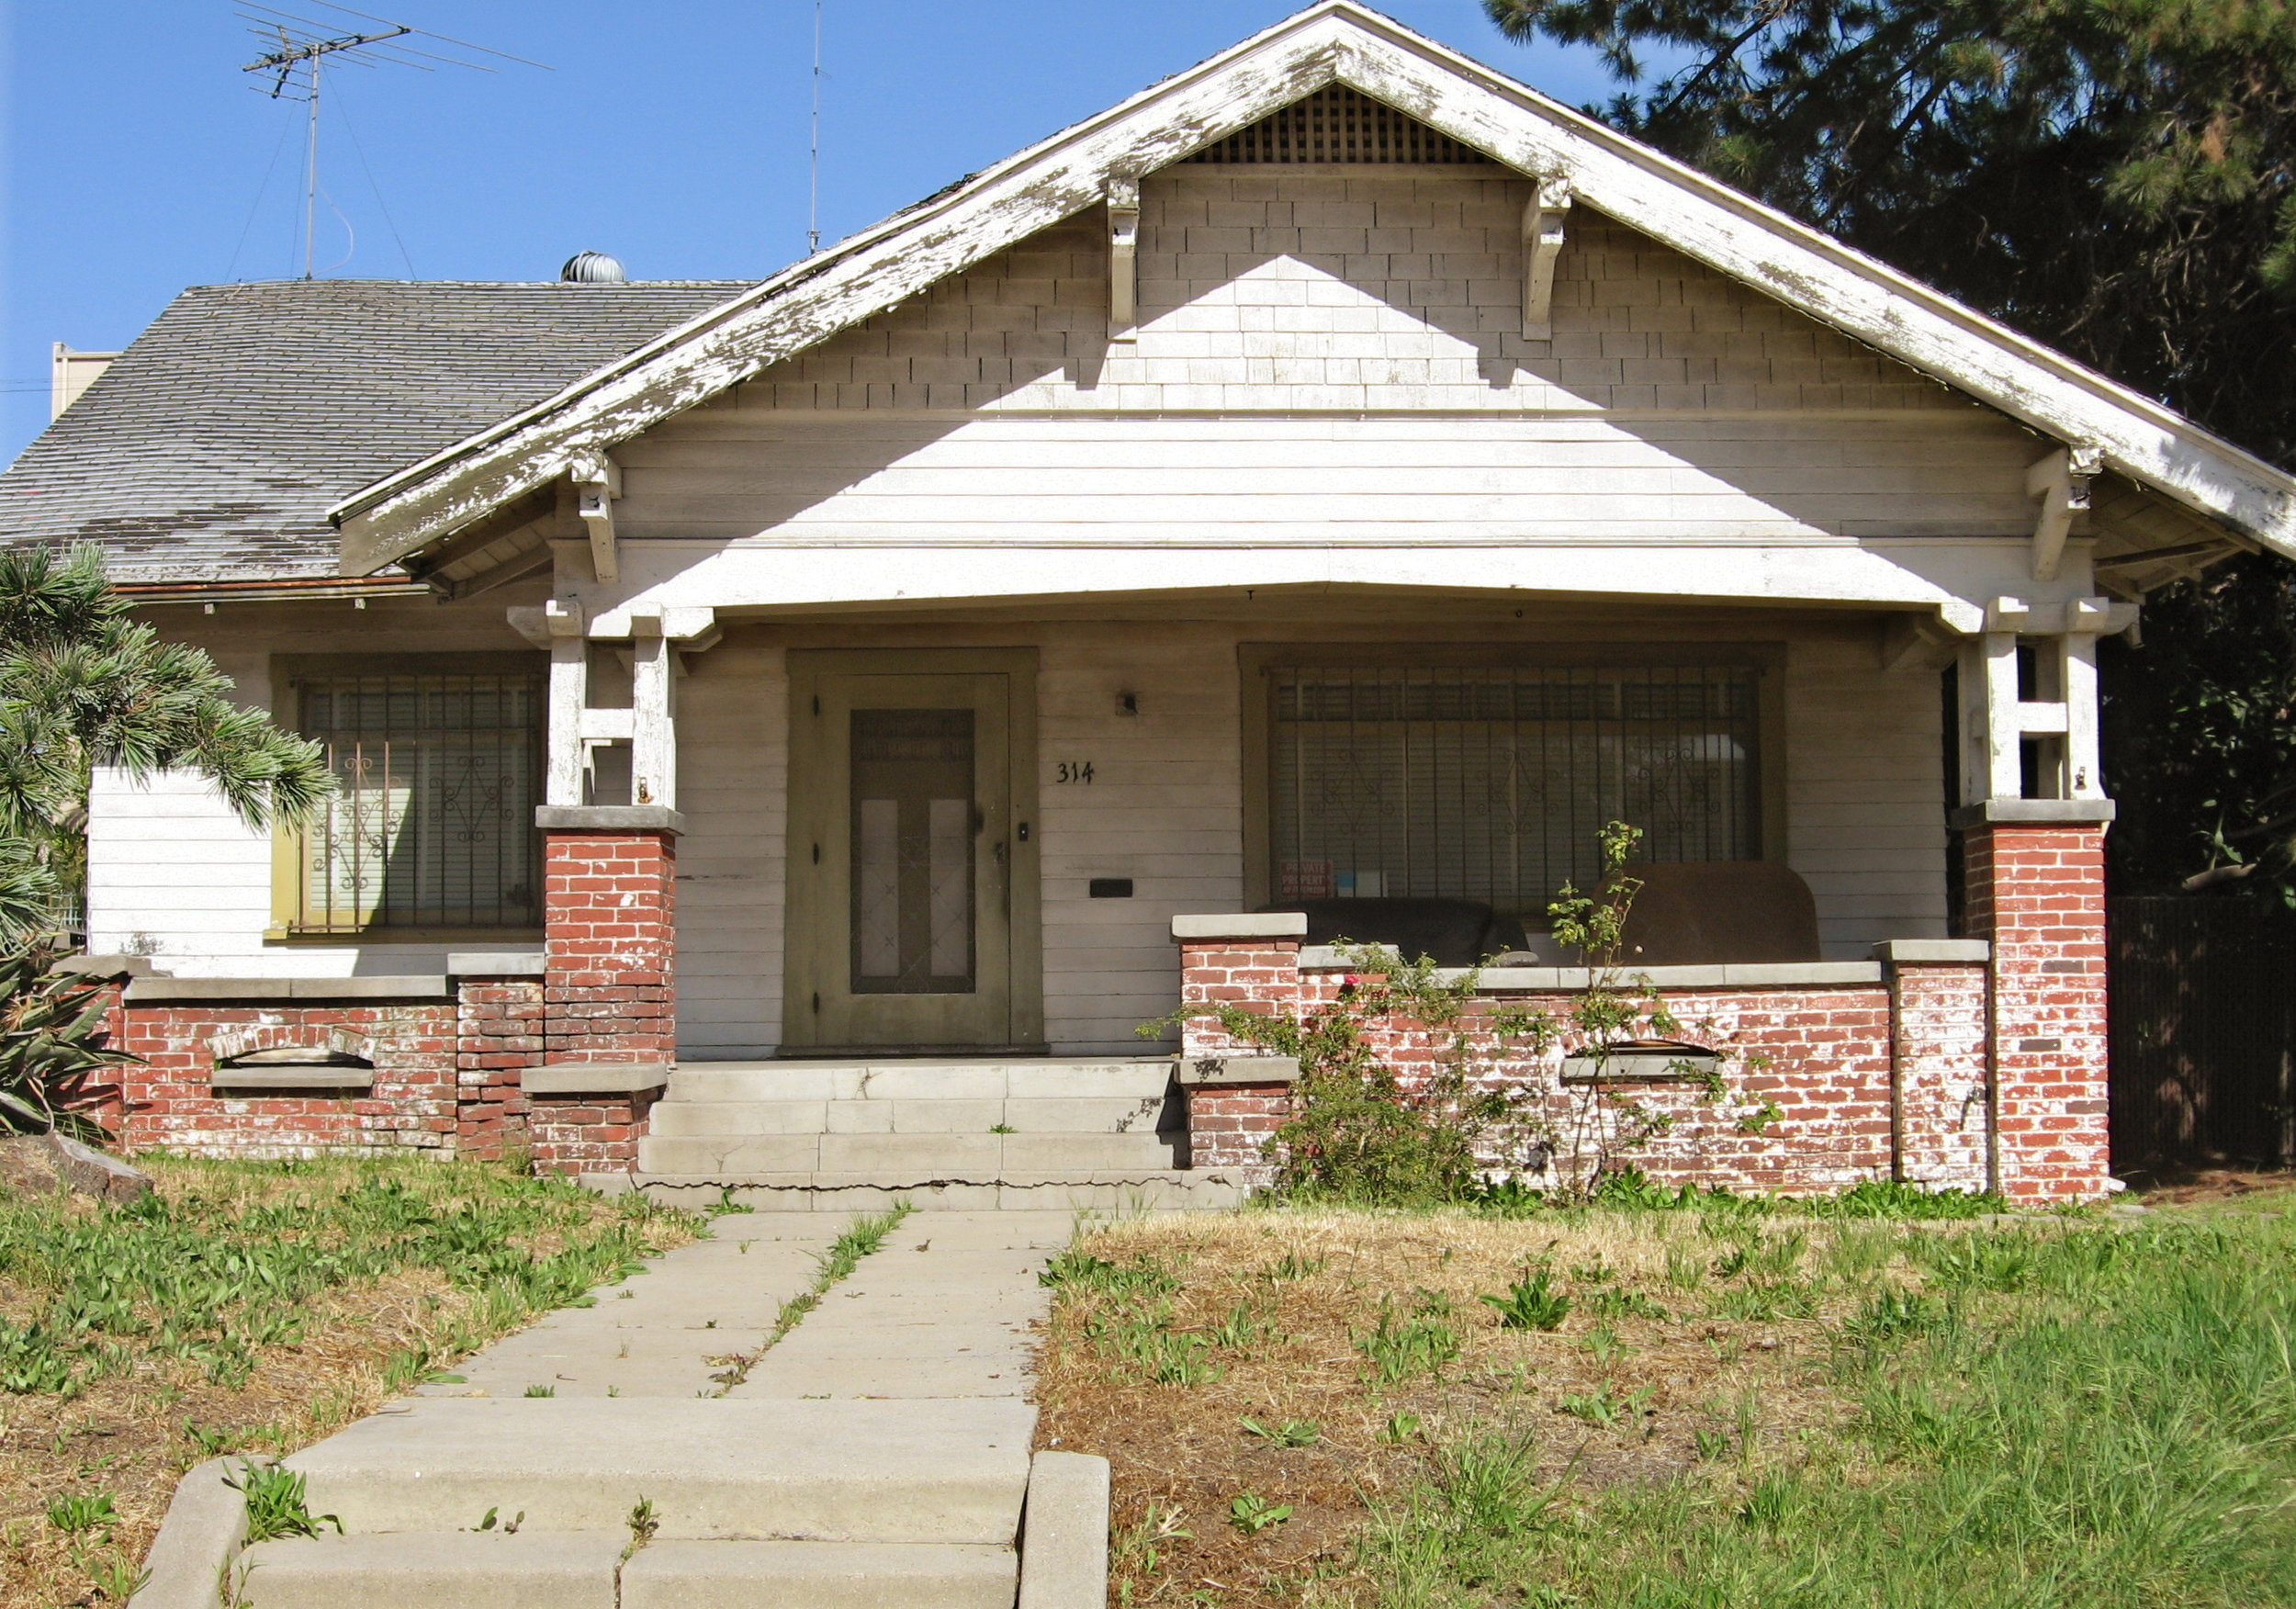 Dilapidated_house.jpg